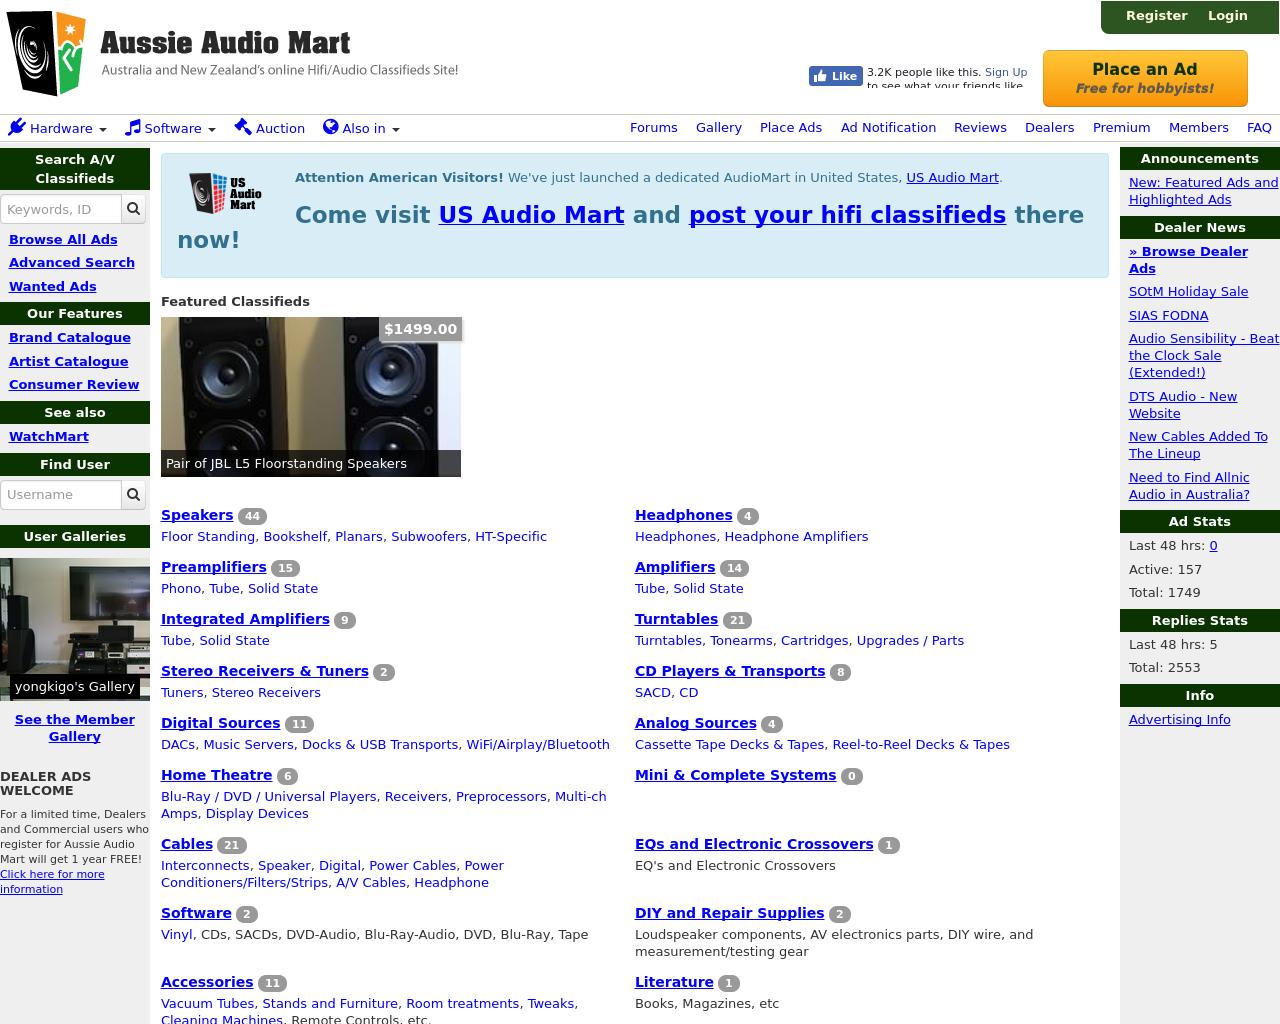 Aussie-Audio-Mart-Advertising-Reviews-Pricing